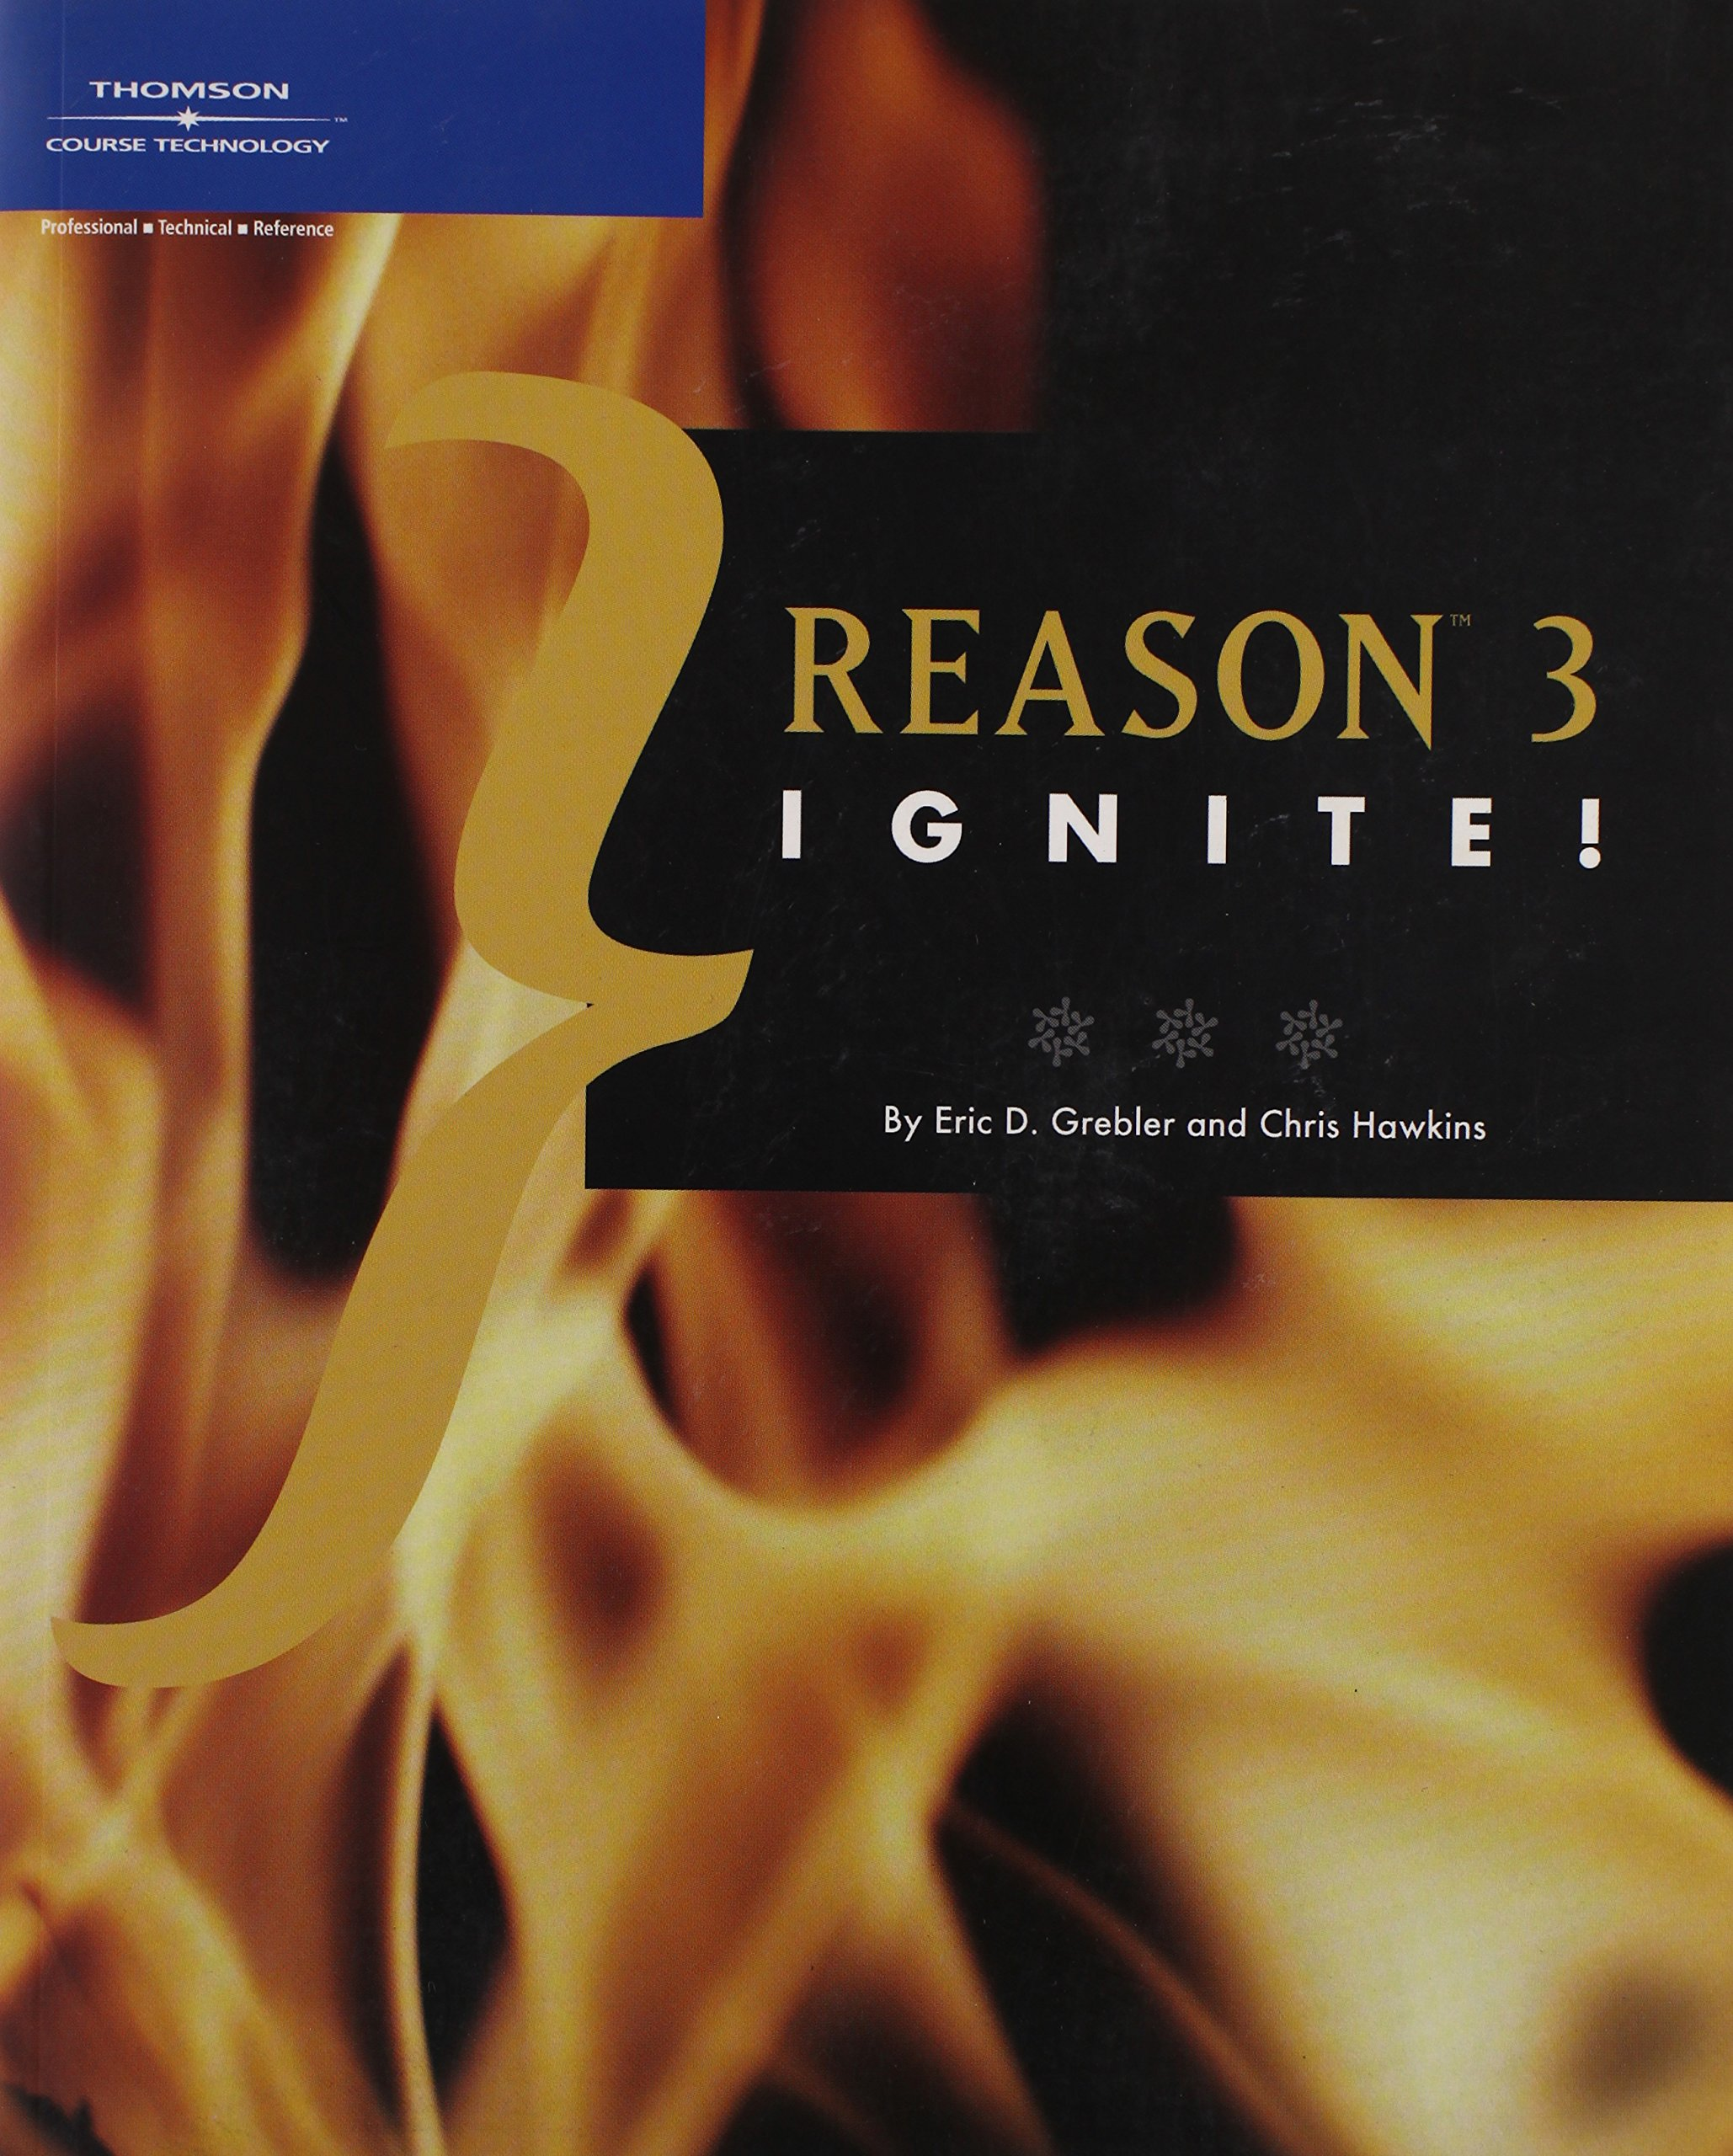 Reason 3 free download full version.